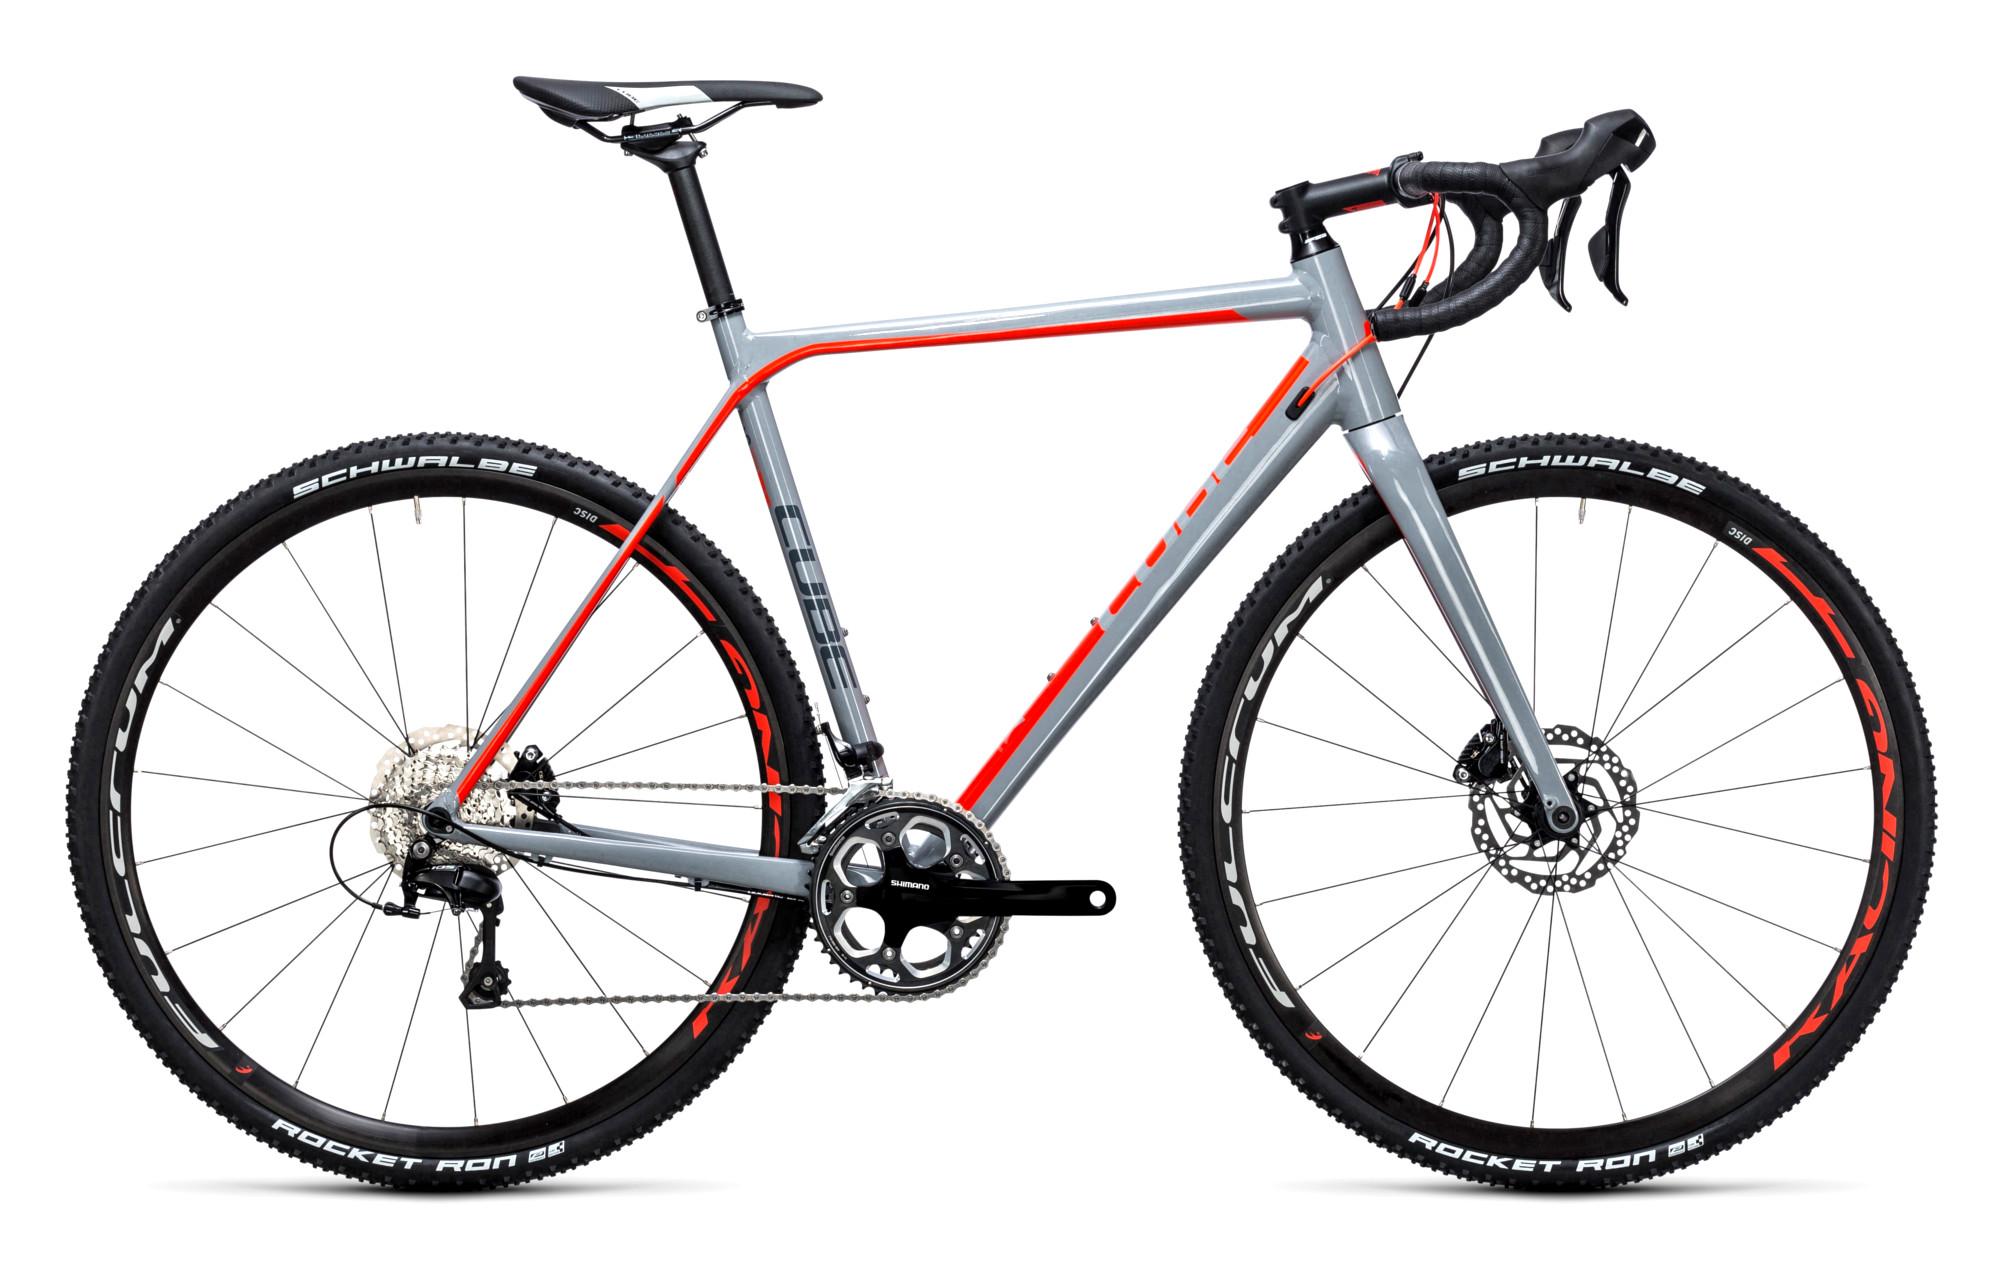 982c268483c CUBE CROSS RACE PRO Cyclocross Bike Grey Red 2017 | Alltricks.com